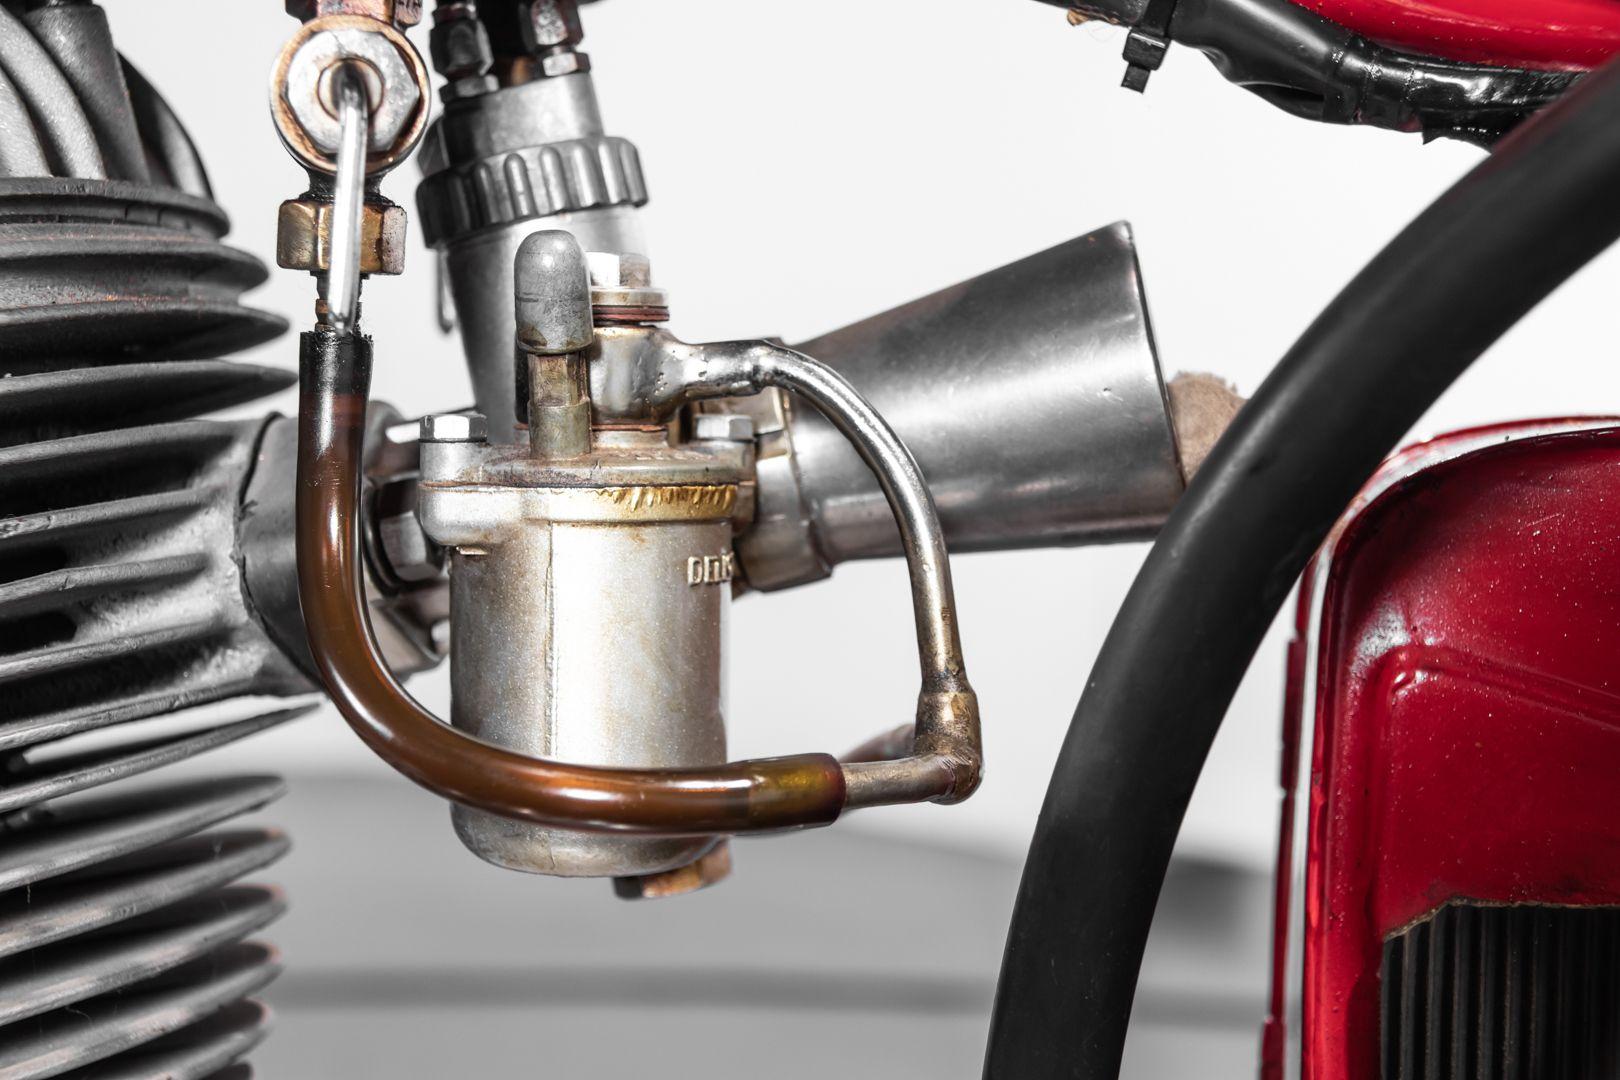 1958 Moto Morini S 175 78032